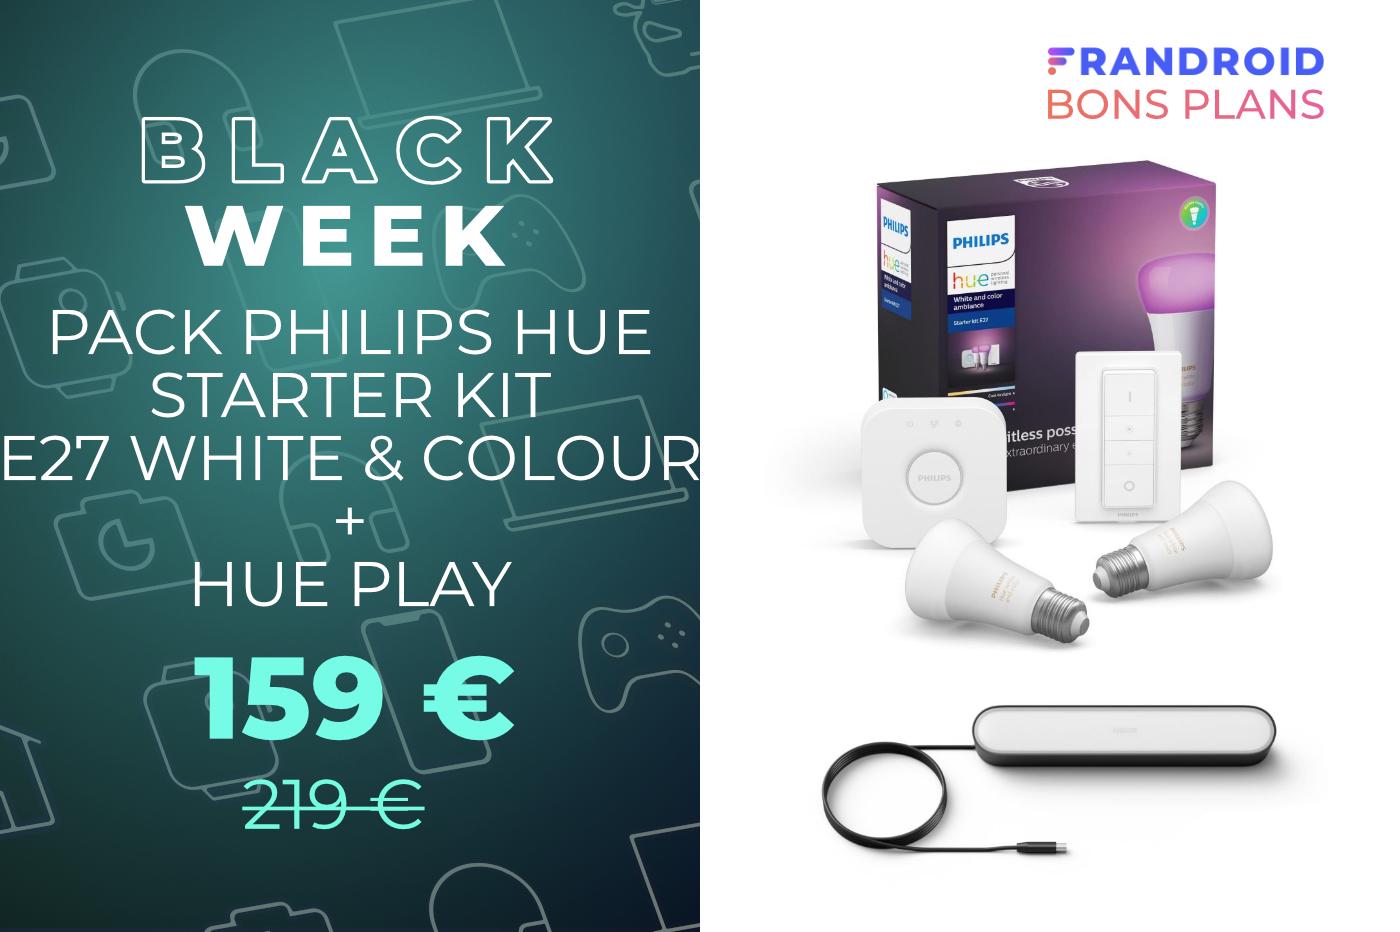 Le prix du starter kit Philips Hue + Hue Play est en forte baisse